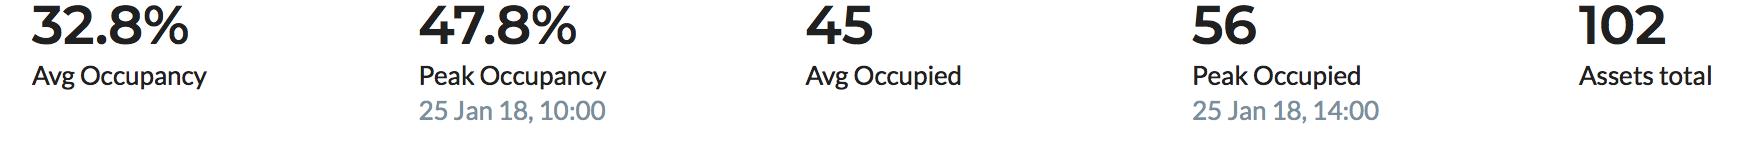 OpenSensors-average-and-peak-deak-occupancy